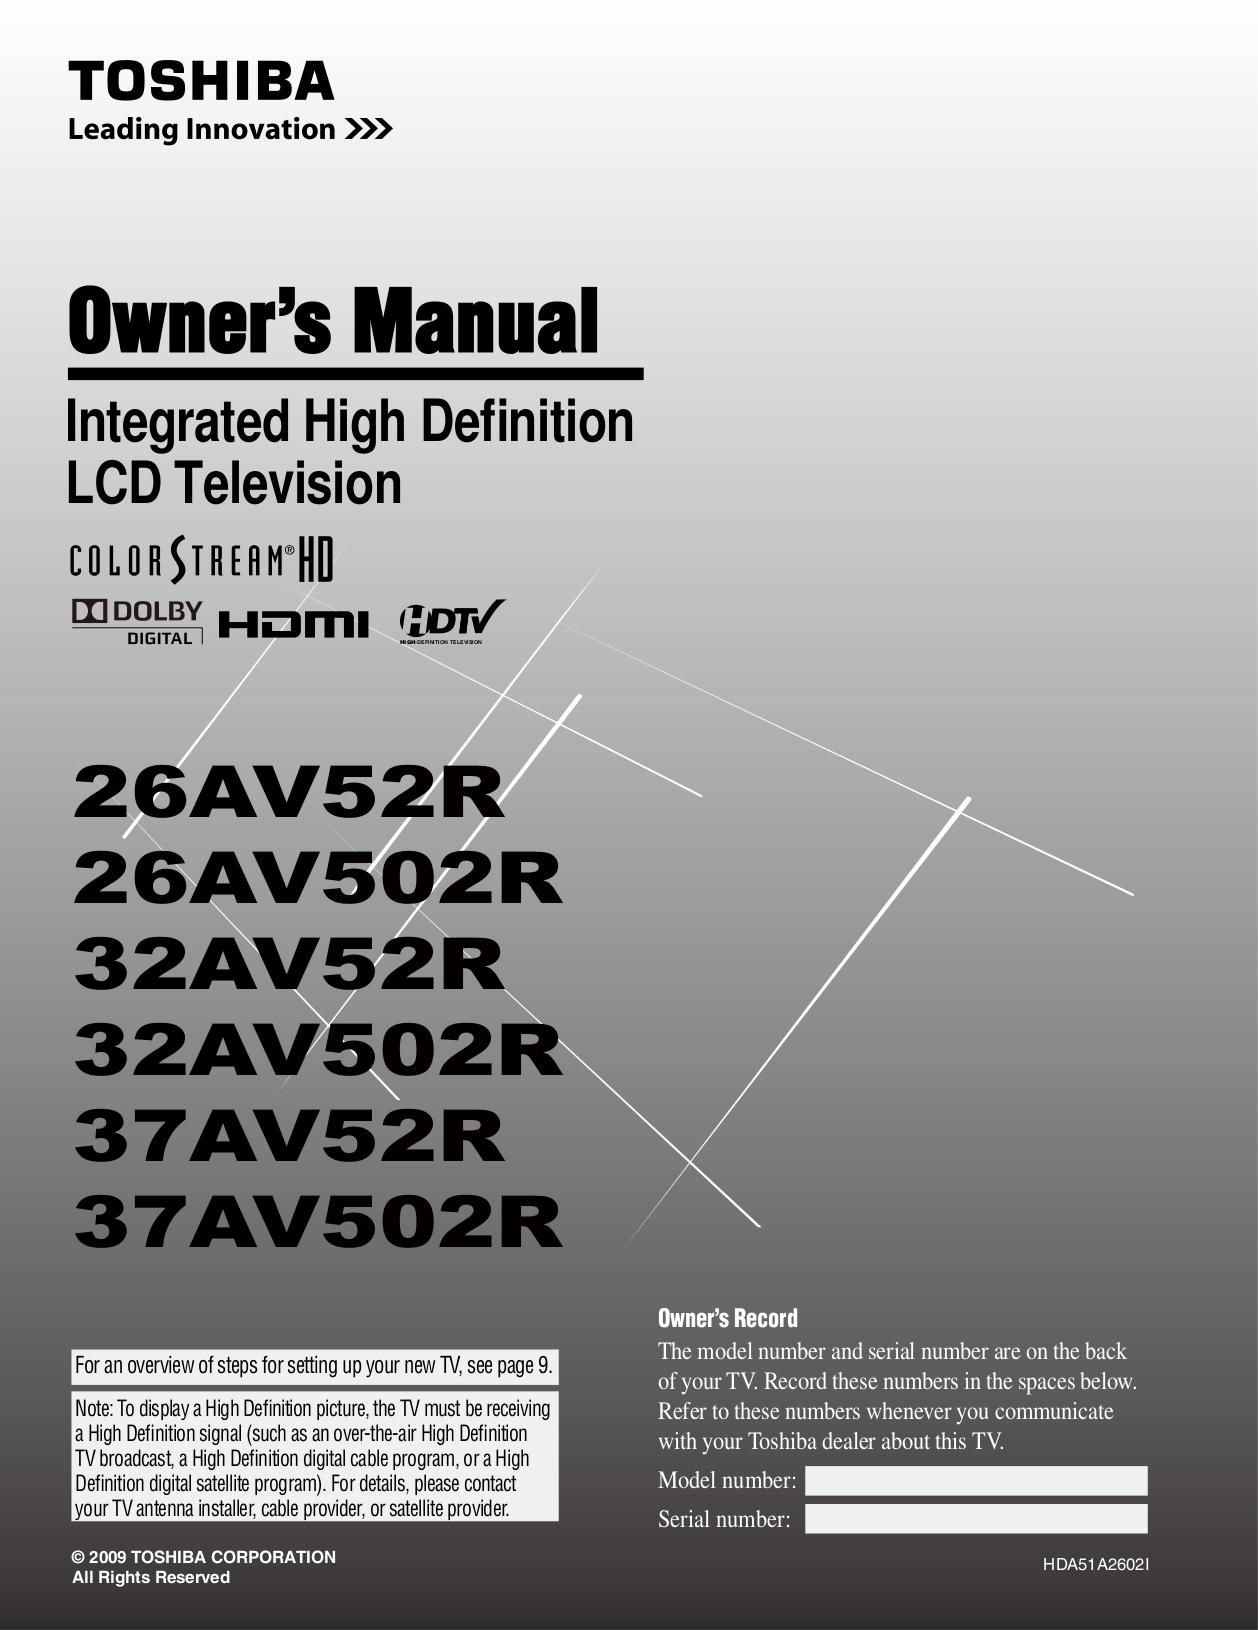 download free pdf for toshiba 37av502r tv manual rh umlib com Toshiba E-Studio203sd Manuals toshiba 37av502r service manual